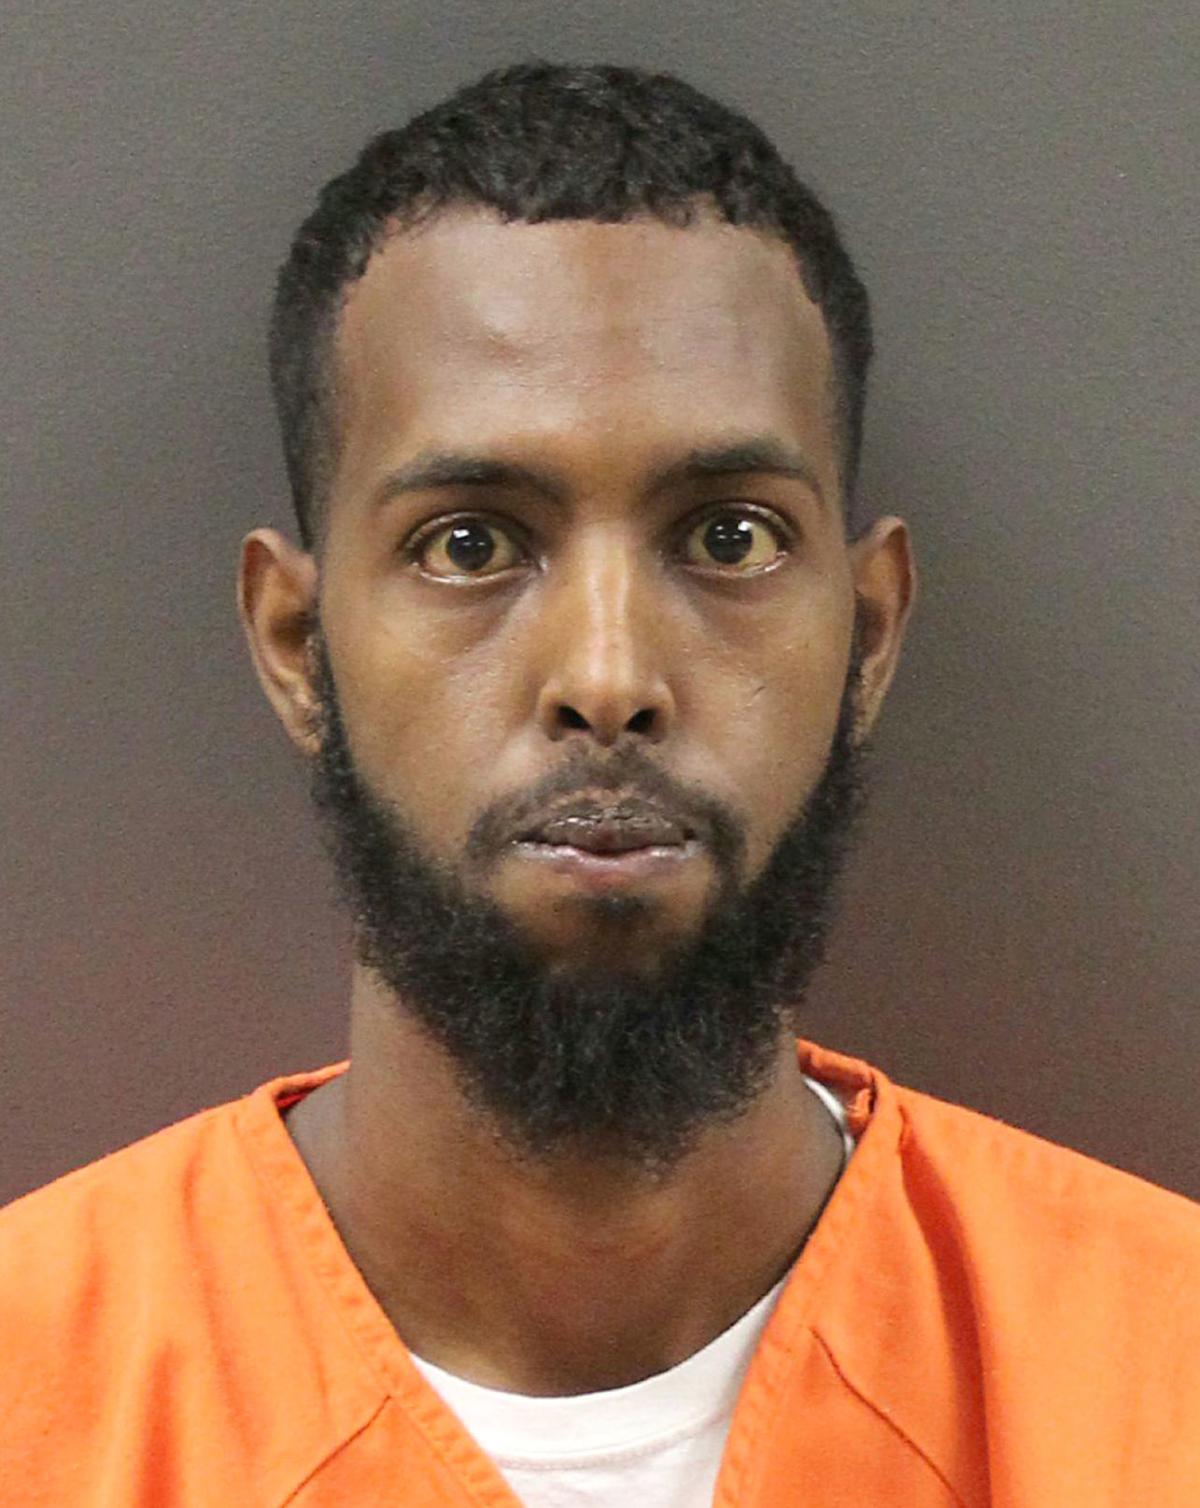 Jama Mohamud Abdi